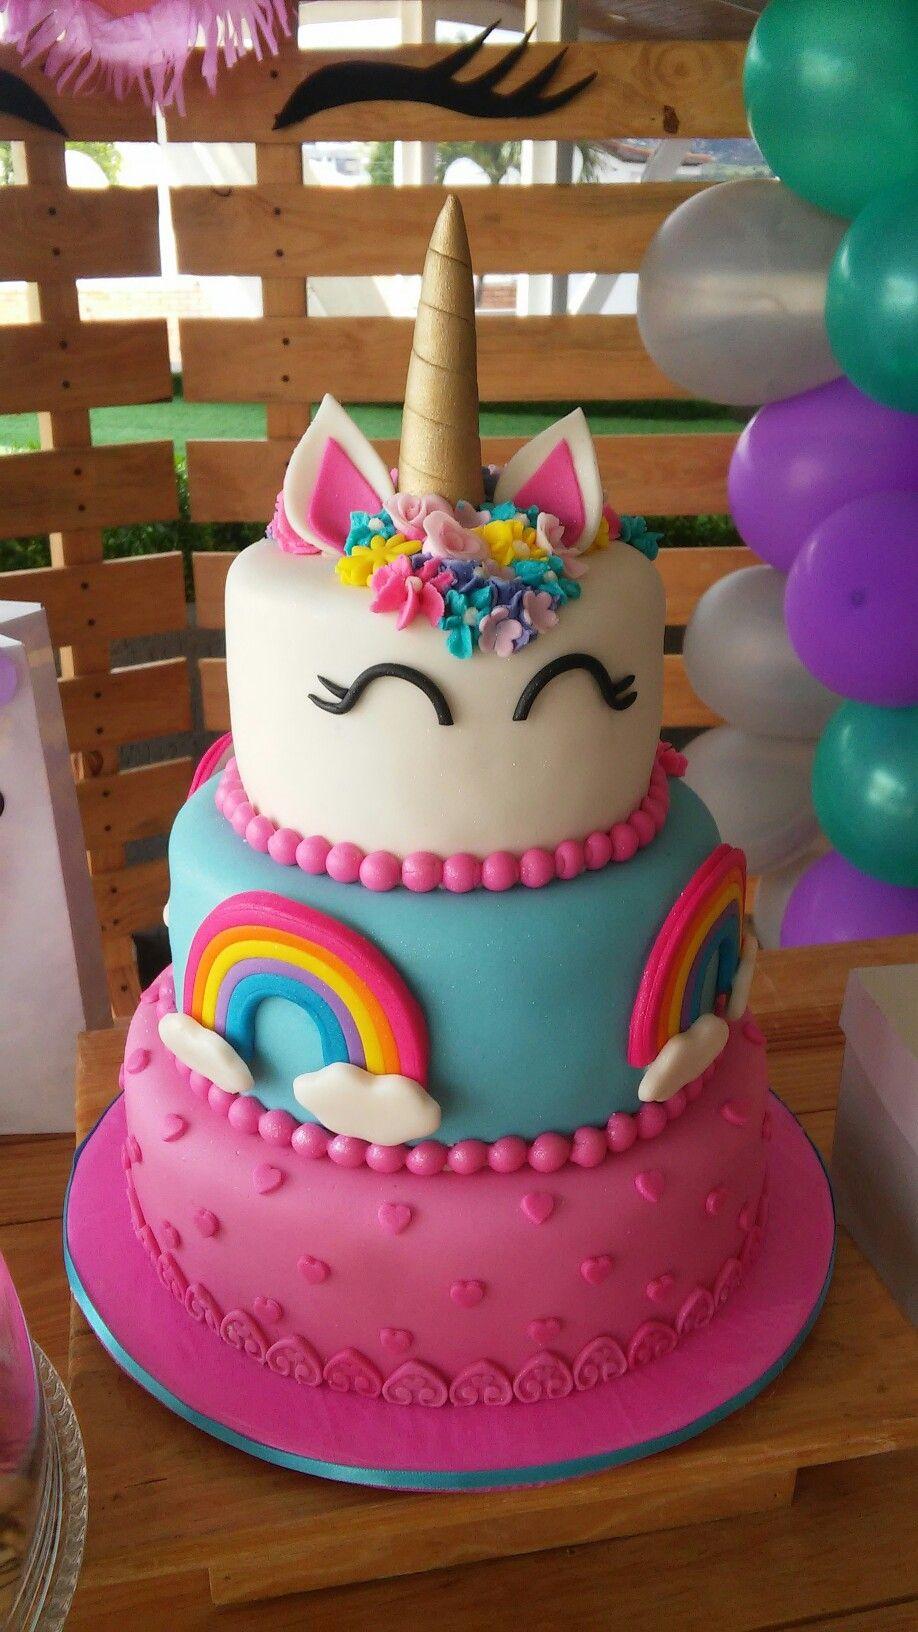 Fabulous Kendalls 6Th Birthday Cake Unicorn Birthday Cake 6Th Birthday Funny Birthday Cards Online Barepcheapnameinfo